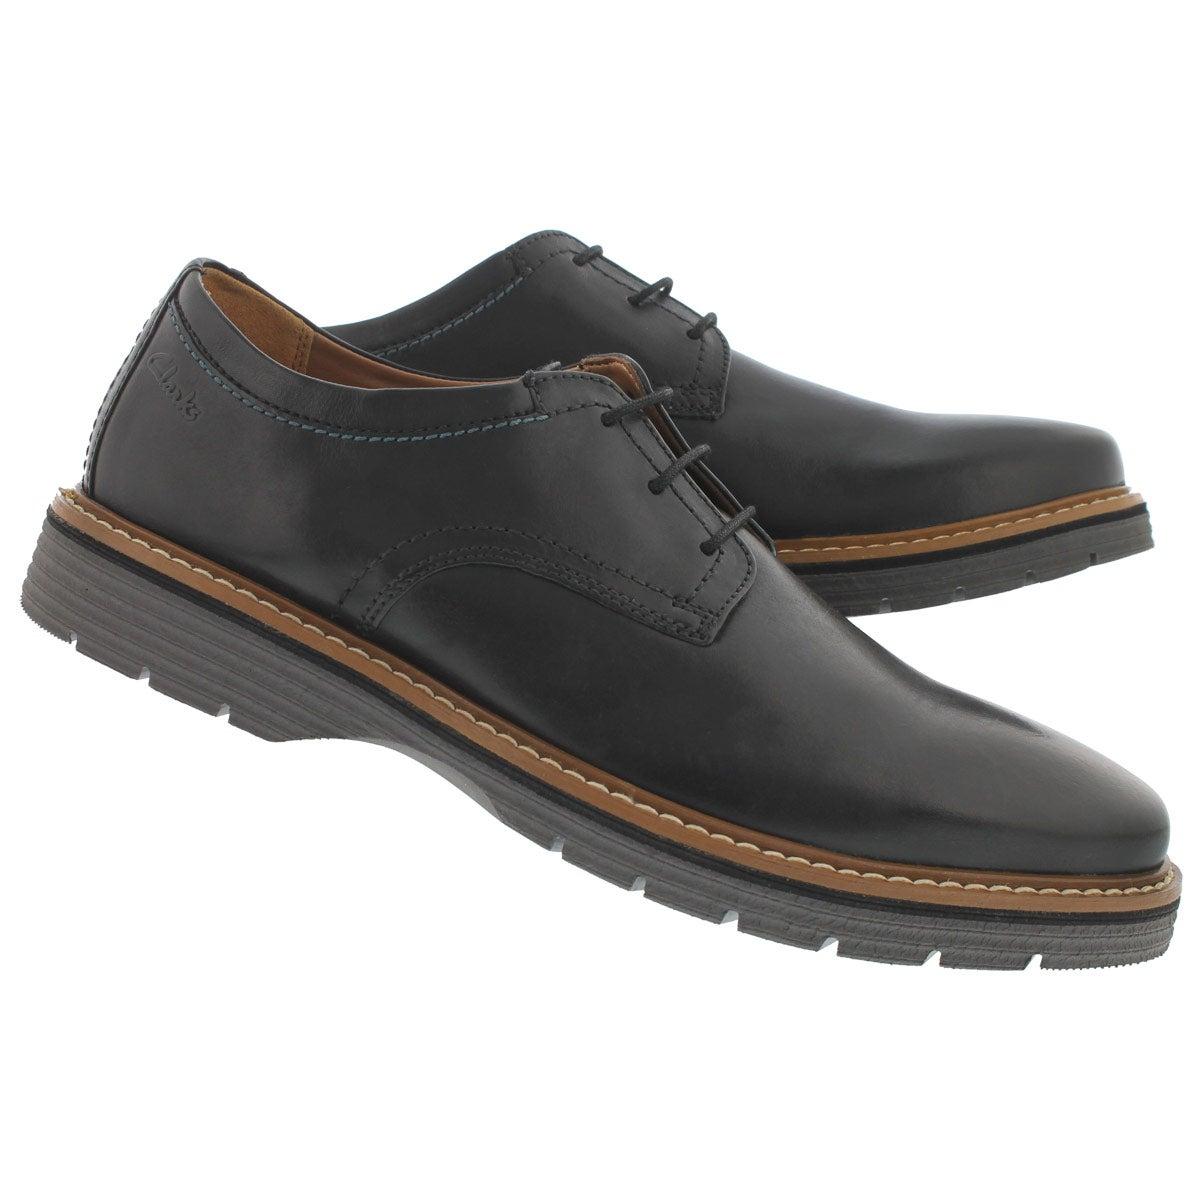 Mns Newkirk Plain blk 3 eye casual shoe